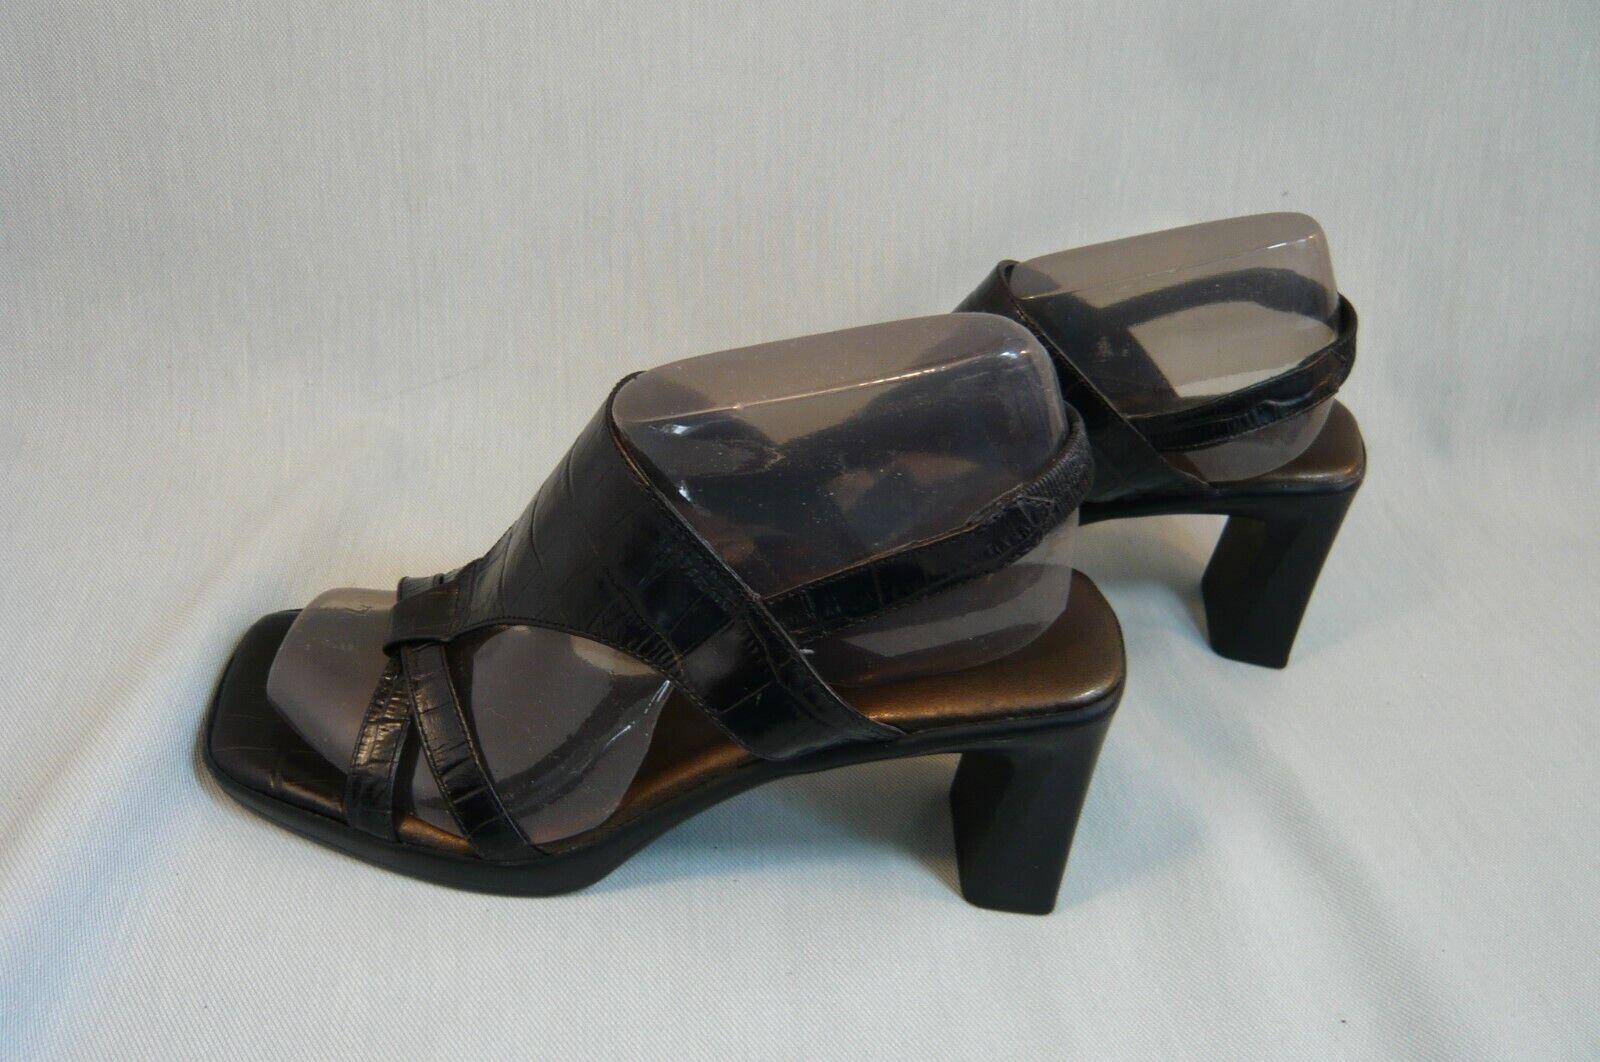 AEROSOLES CHUNKY HEEL SANDALS-Size 5 1/2 B-Black Croc Look-Heels about 2 3/4